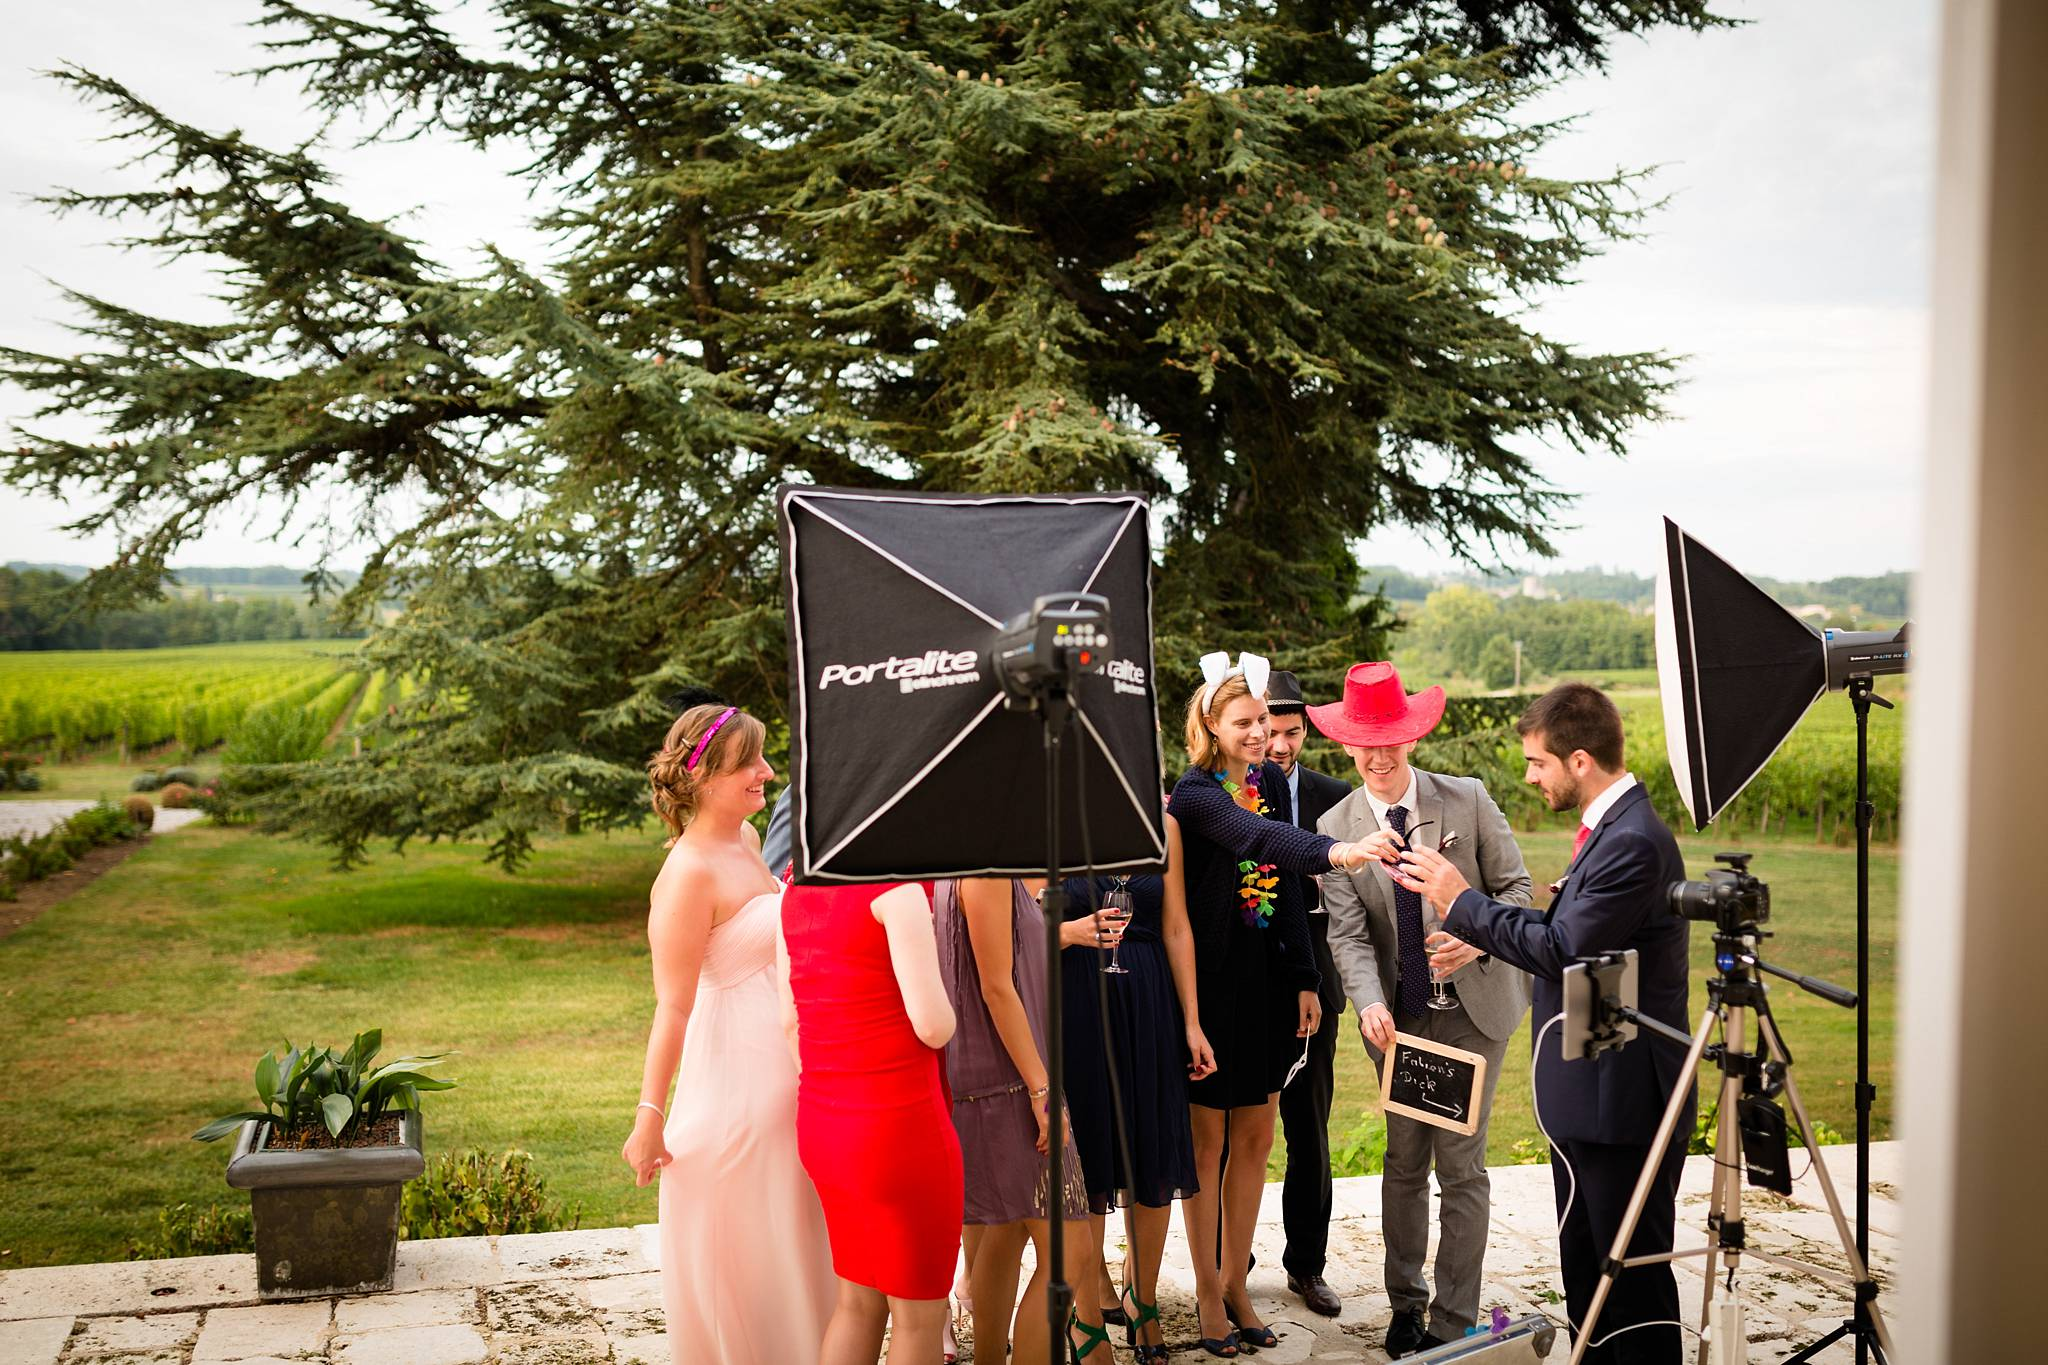 01_photobooth-mariage-backstage-bordeaux-gironde-dordogne-charentes-alexandre-roschewitz-photographies_2048px